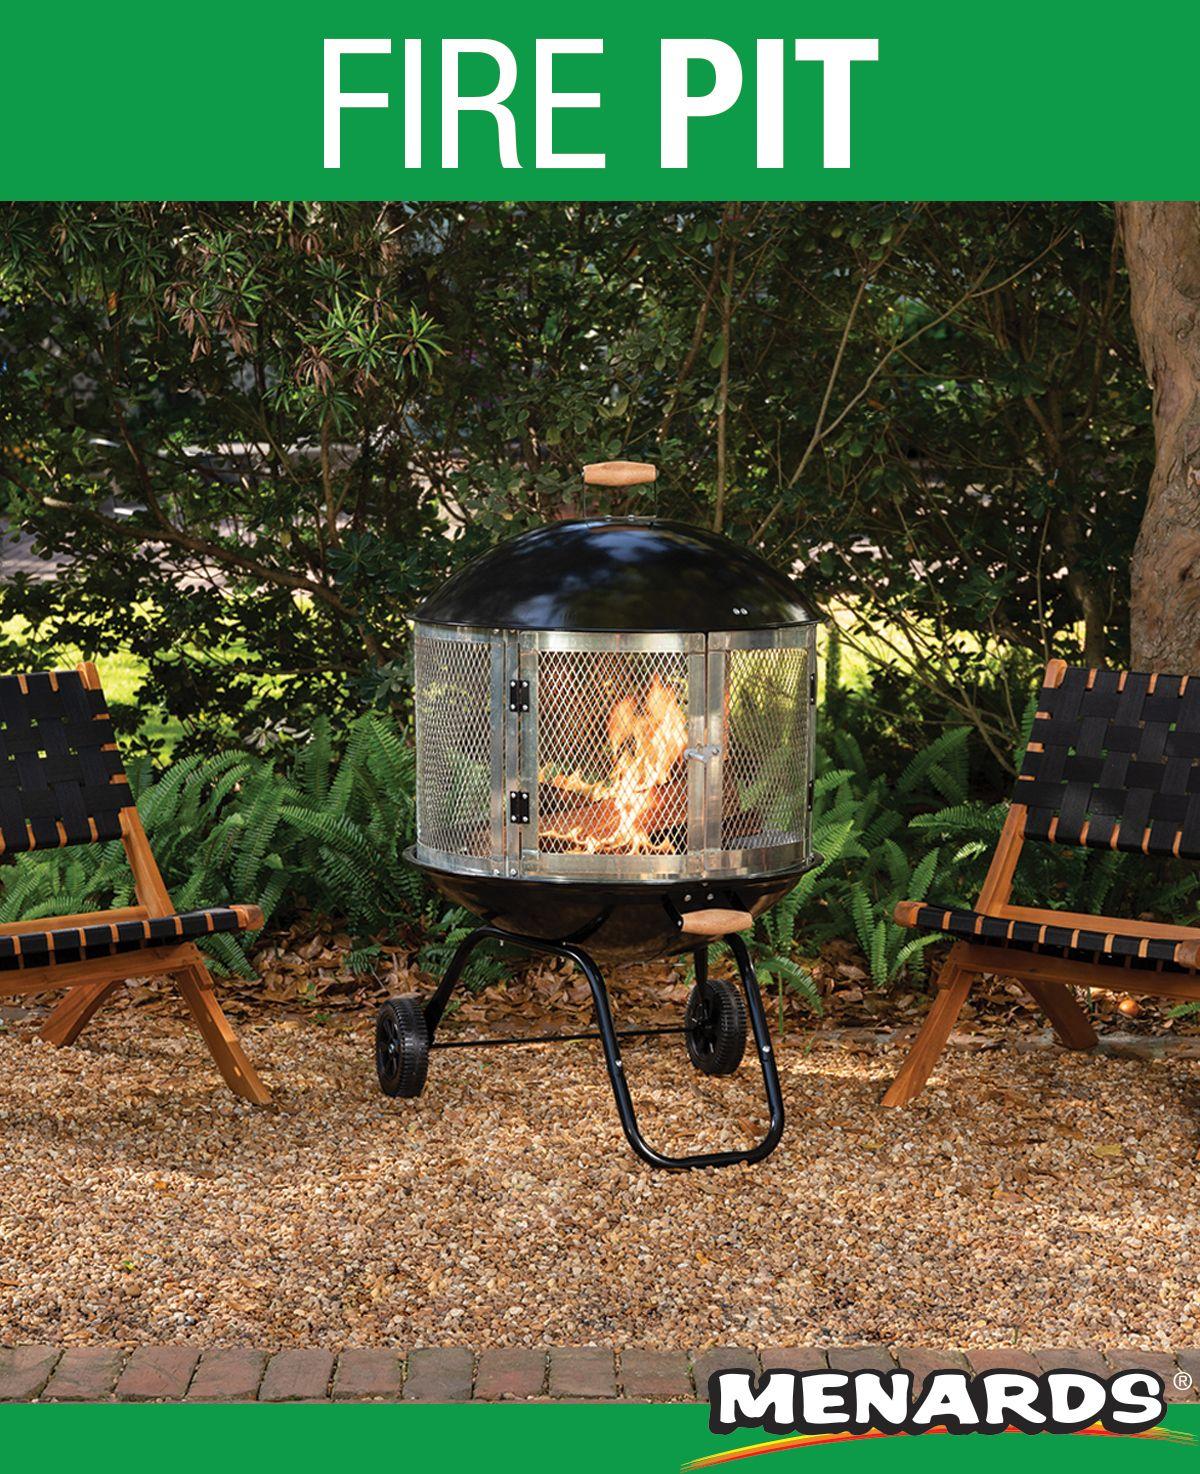 Backyard Creations 28 Portable Steel Fire Pit Backyard Creations Fire Pit Cover Fire Pit